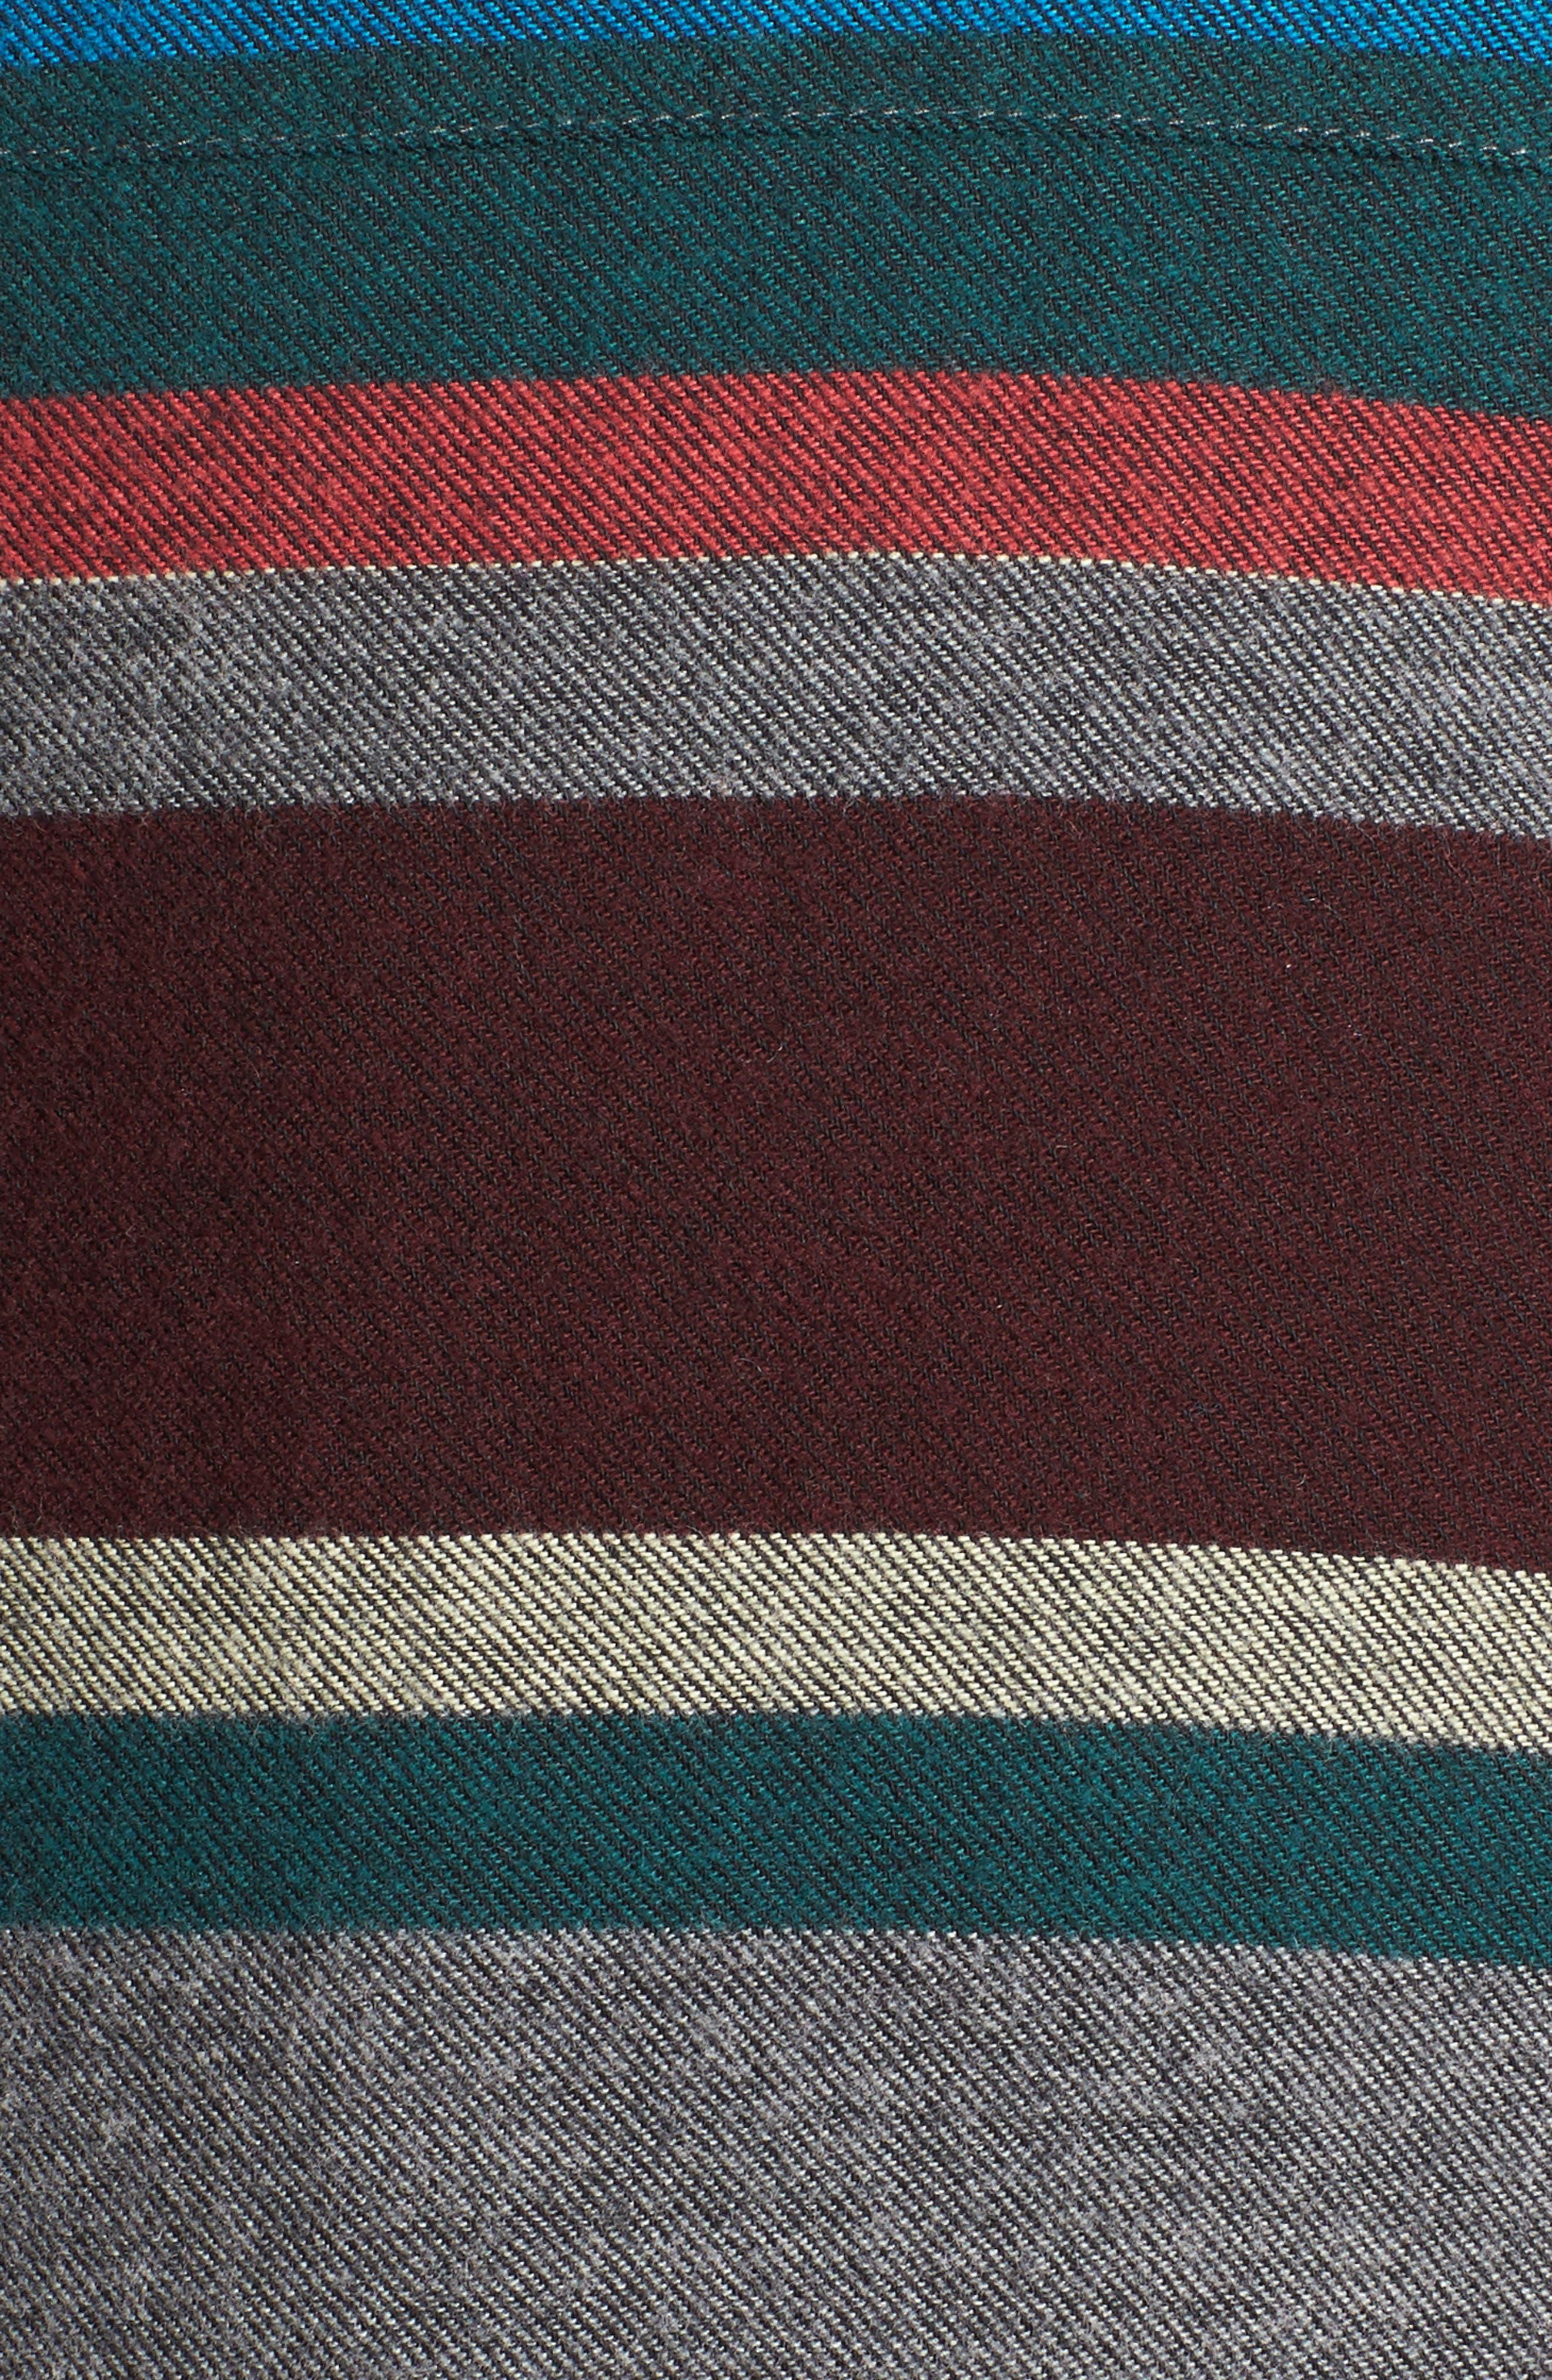 Arcot Woven Shirt,                             Alternate thumbnail 5, color,                             020